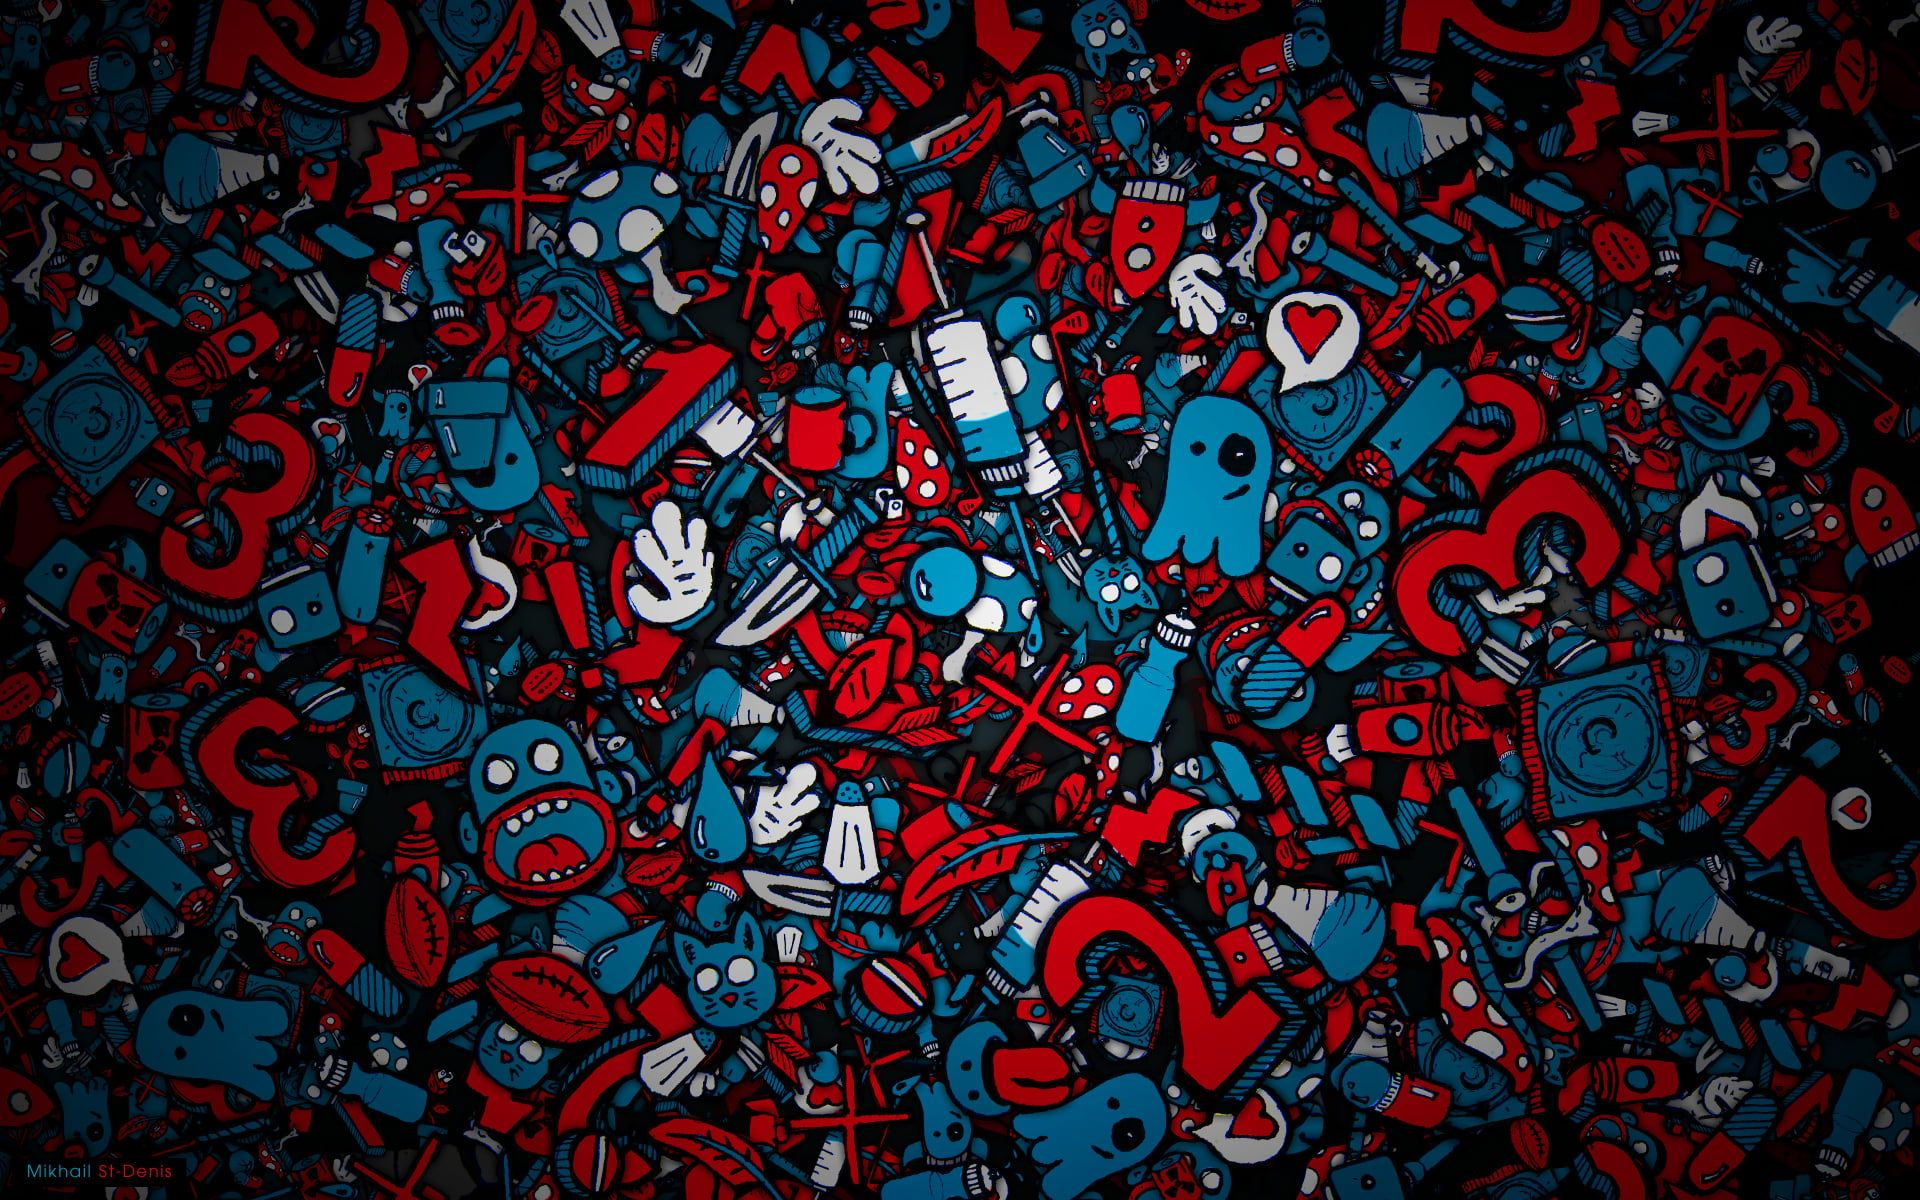 Blue And Red Monsters Illustration Faces Syringe Piling Up Figures 1080p Wallpaper Hdwallpaper Desktop Gambar Wallpaper Keren Disney Up